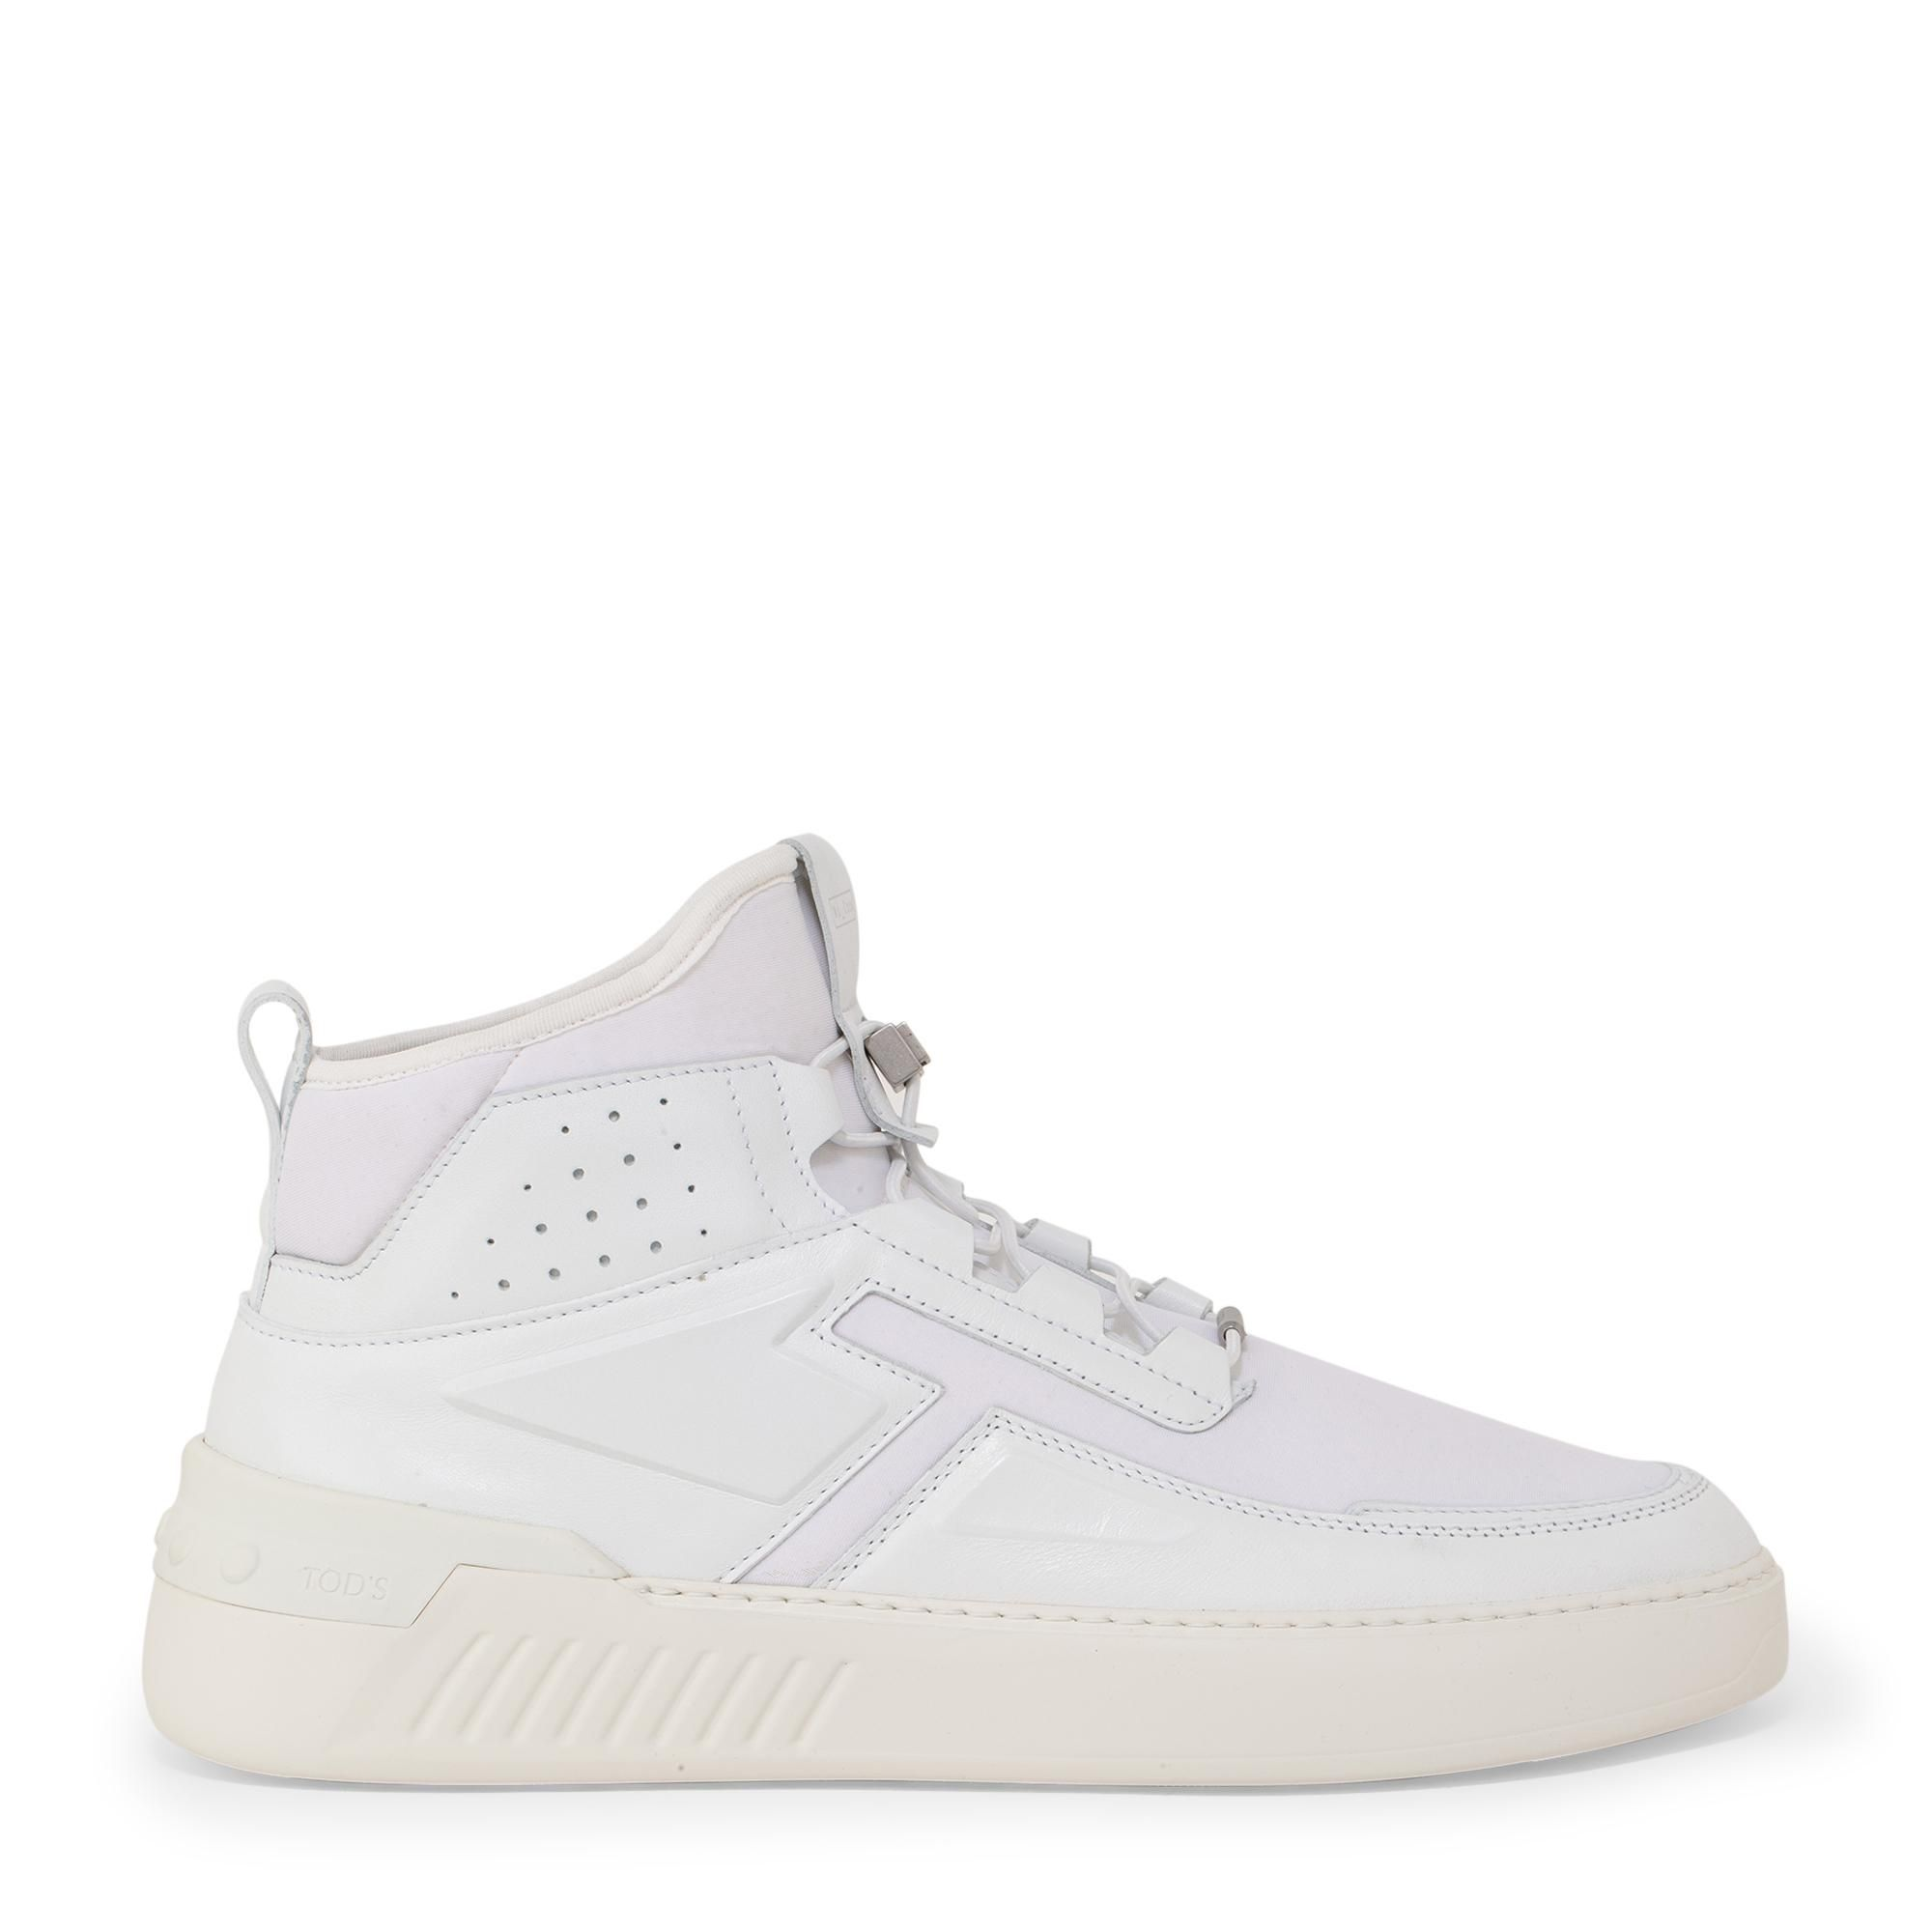 No_Code X high top sneakers